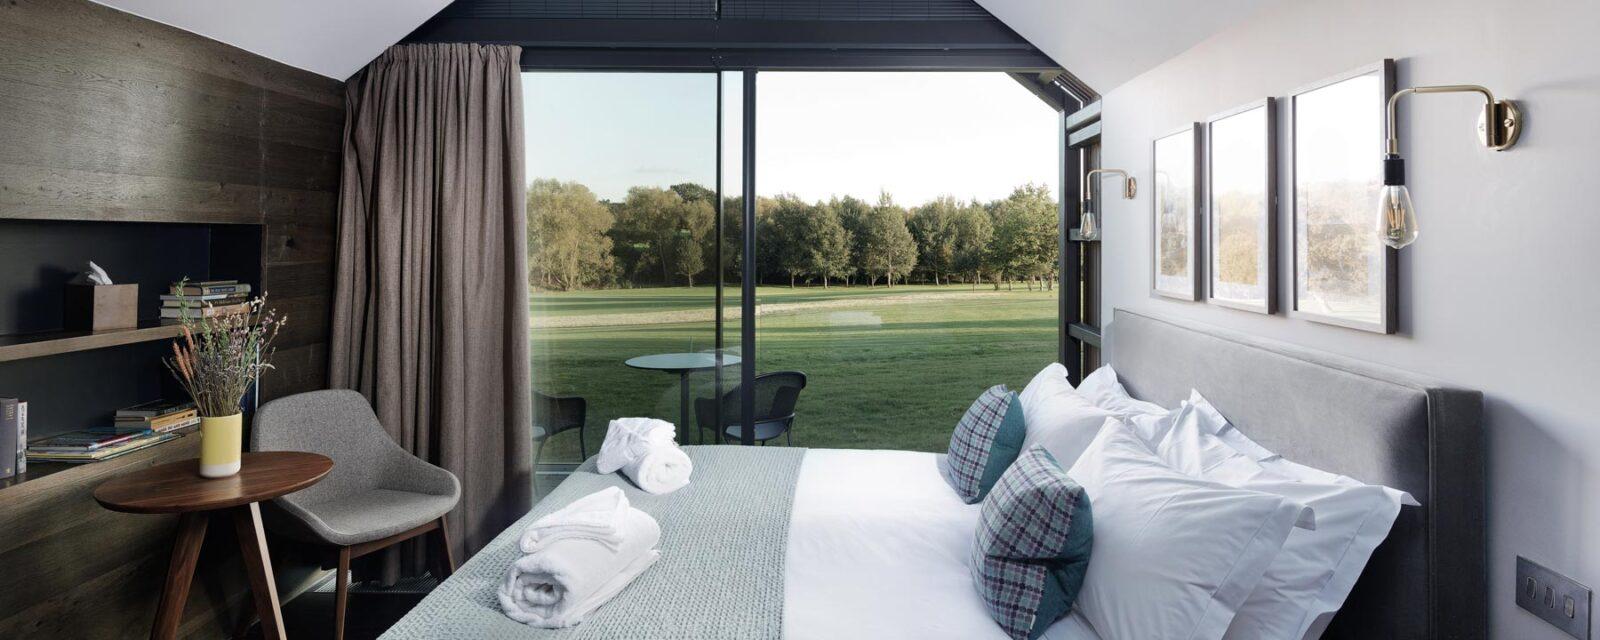 Design Engine Feldon Valley Bedroom Lodge Interior overlooking golf course